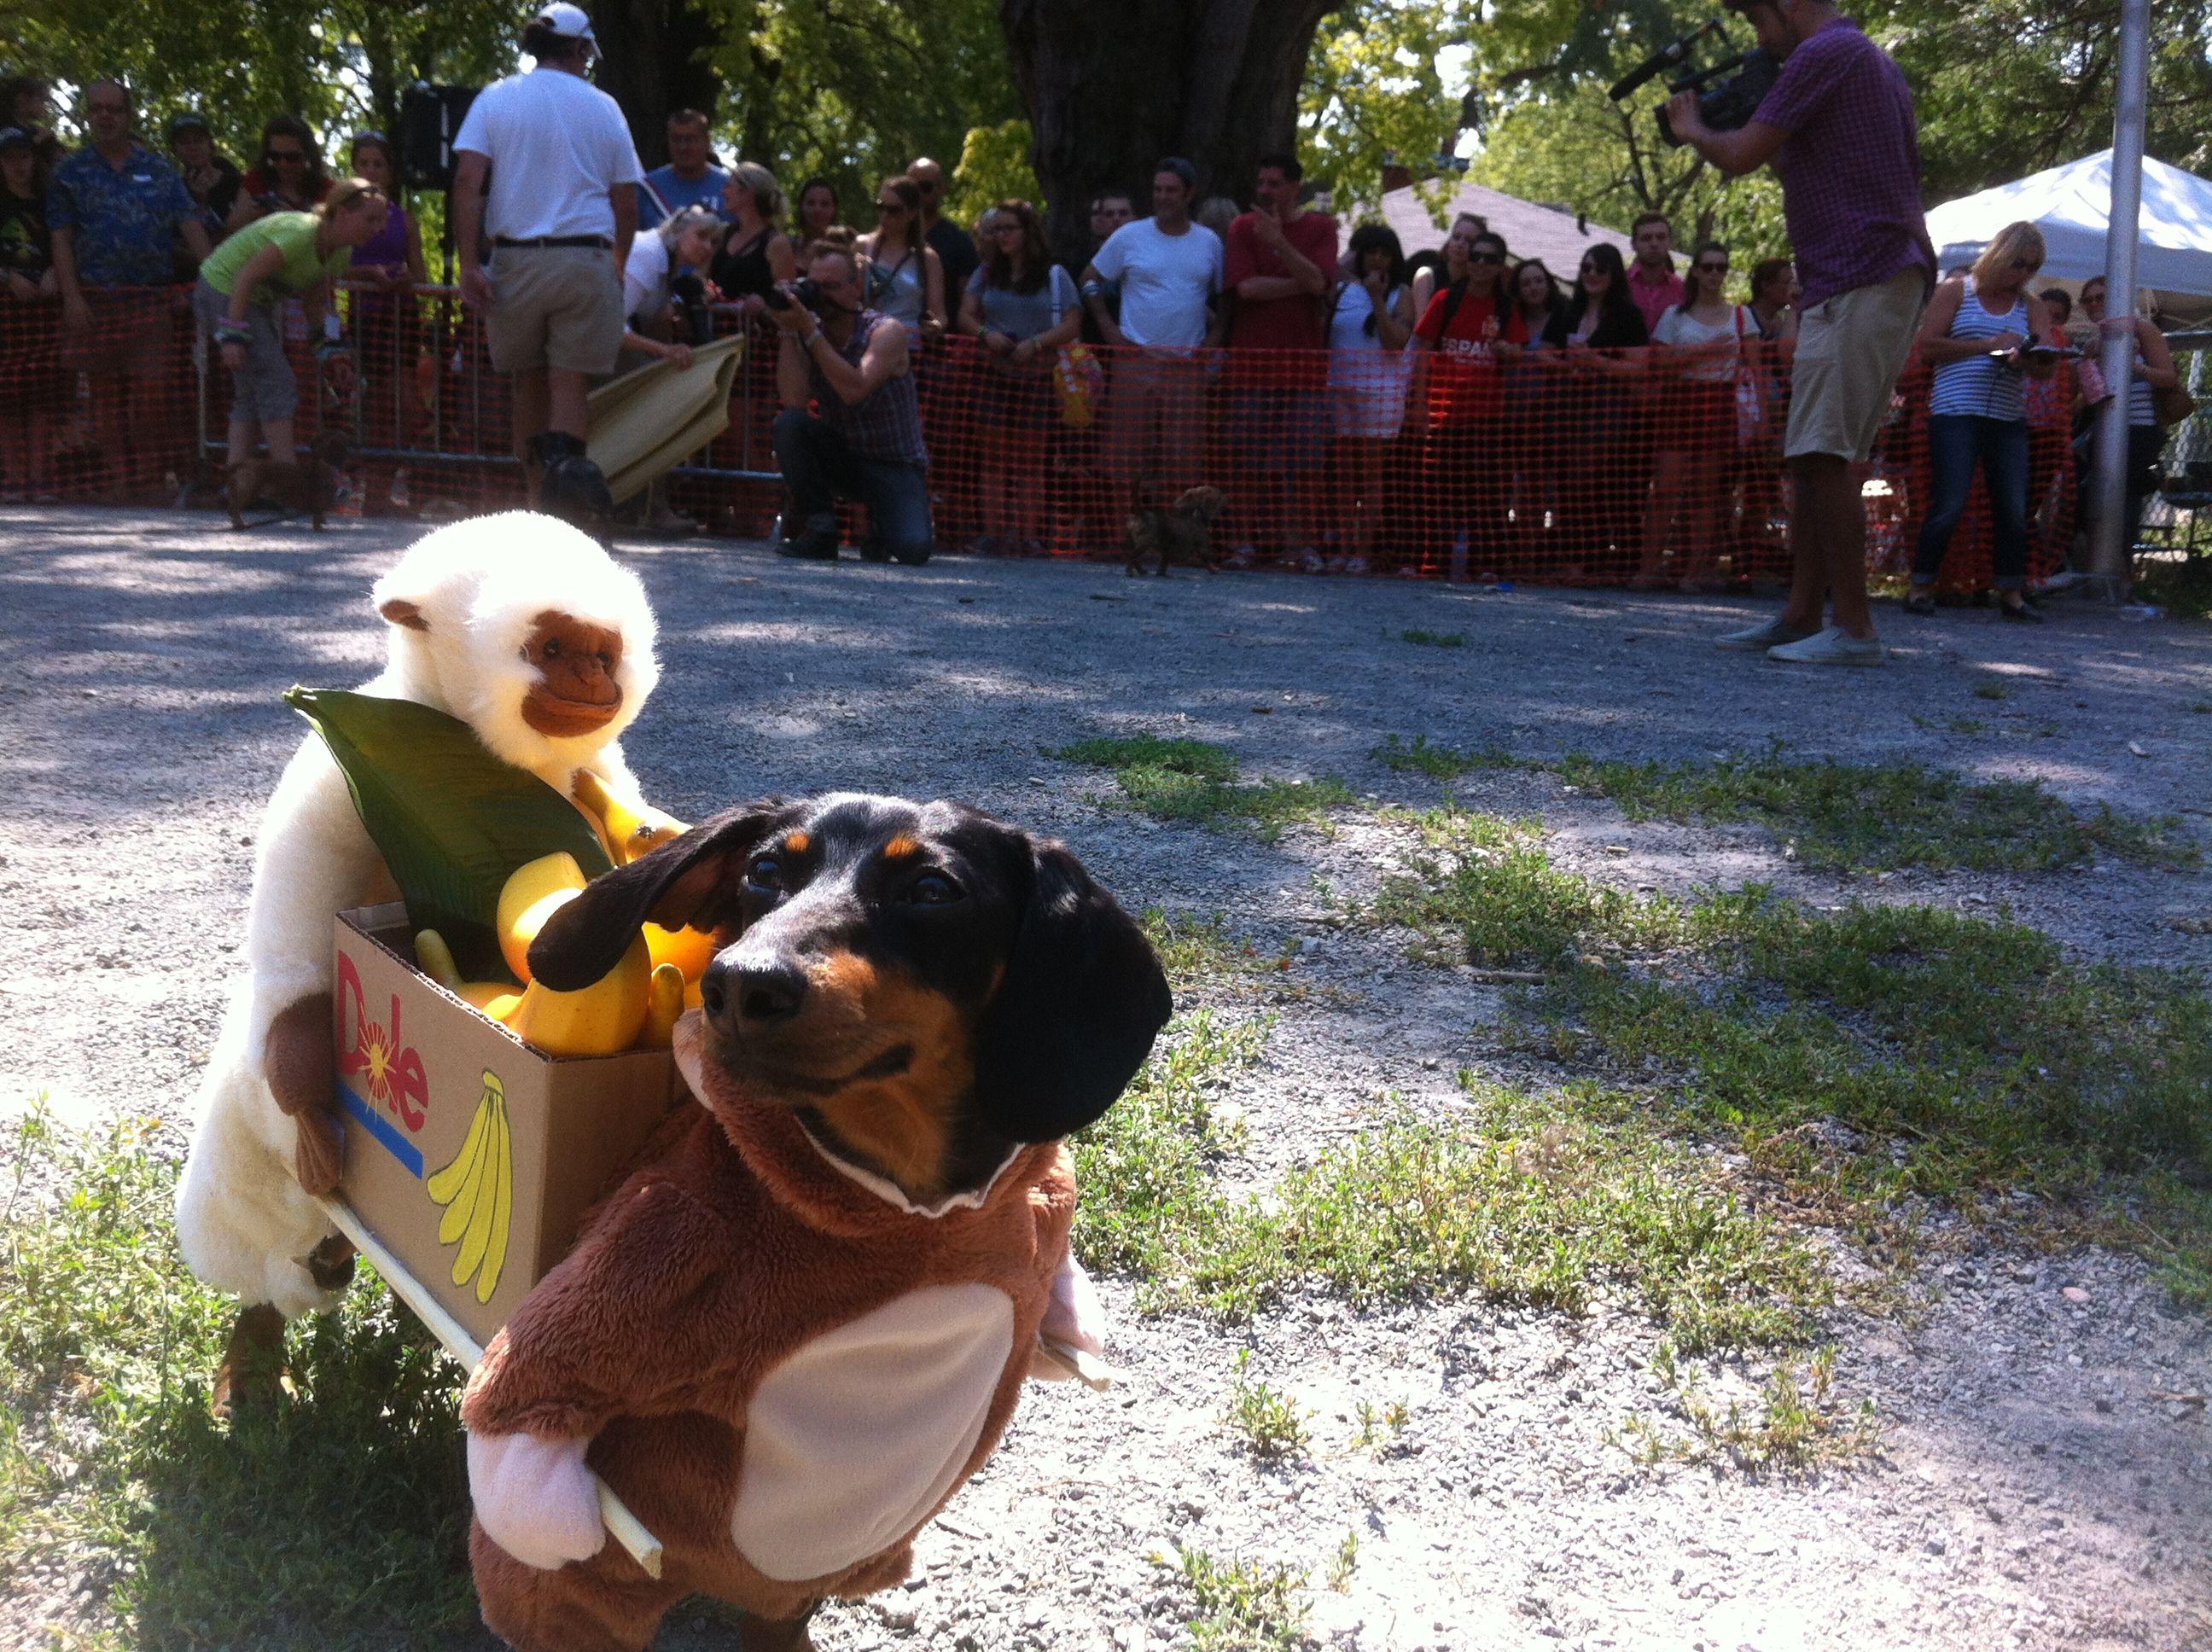 The Annual Wiener Dog Race Crusoe The Celebrity Dachshund